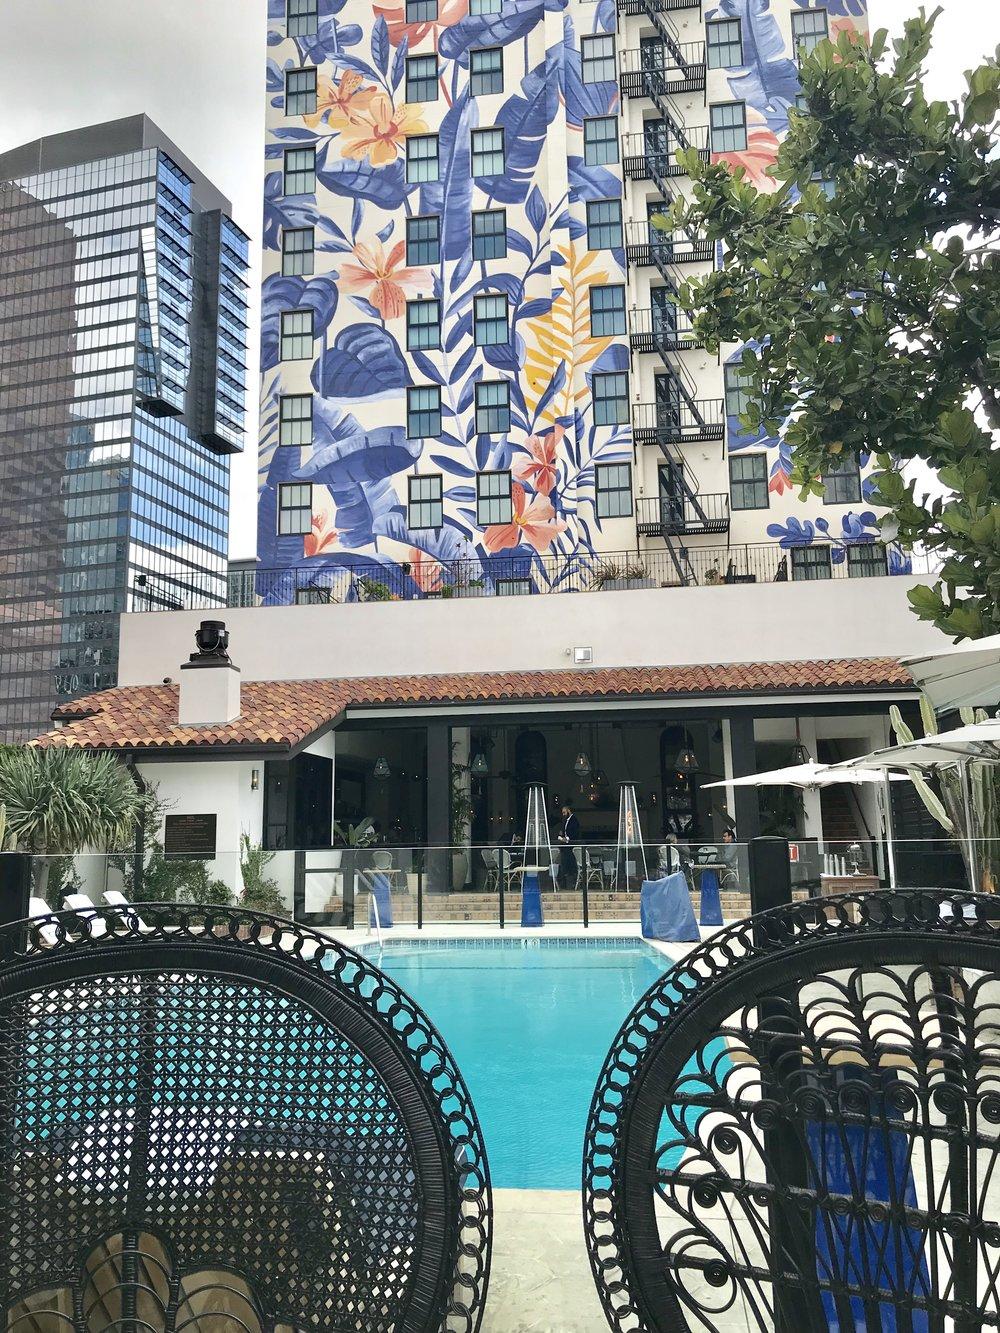 Great pool & bar @HotelFigueroa - #DestinationCA